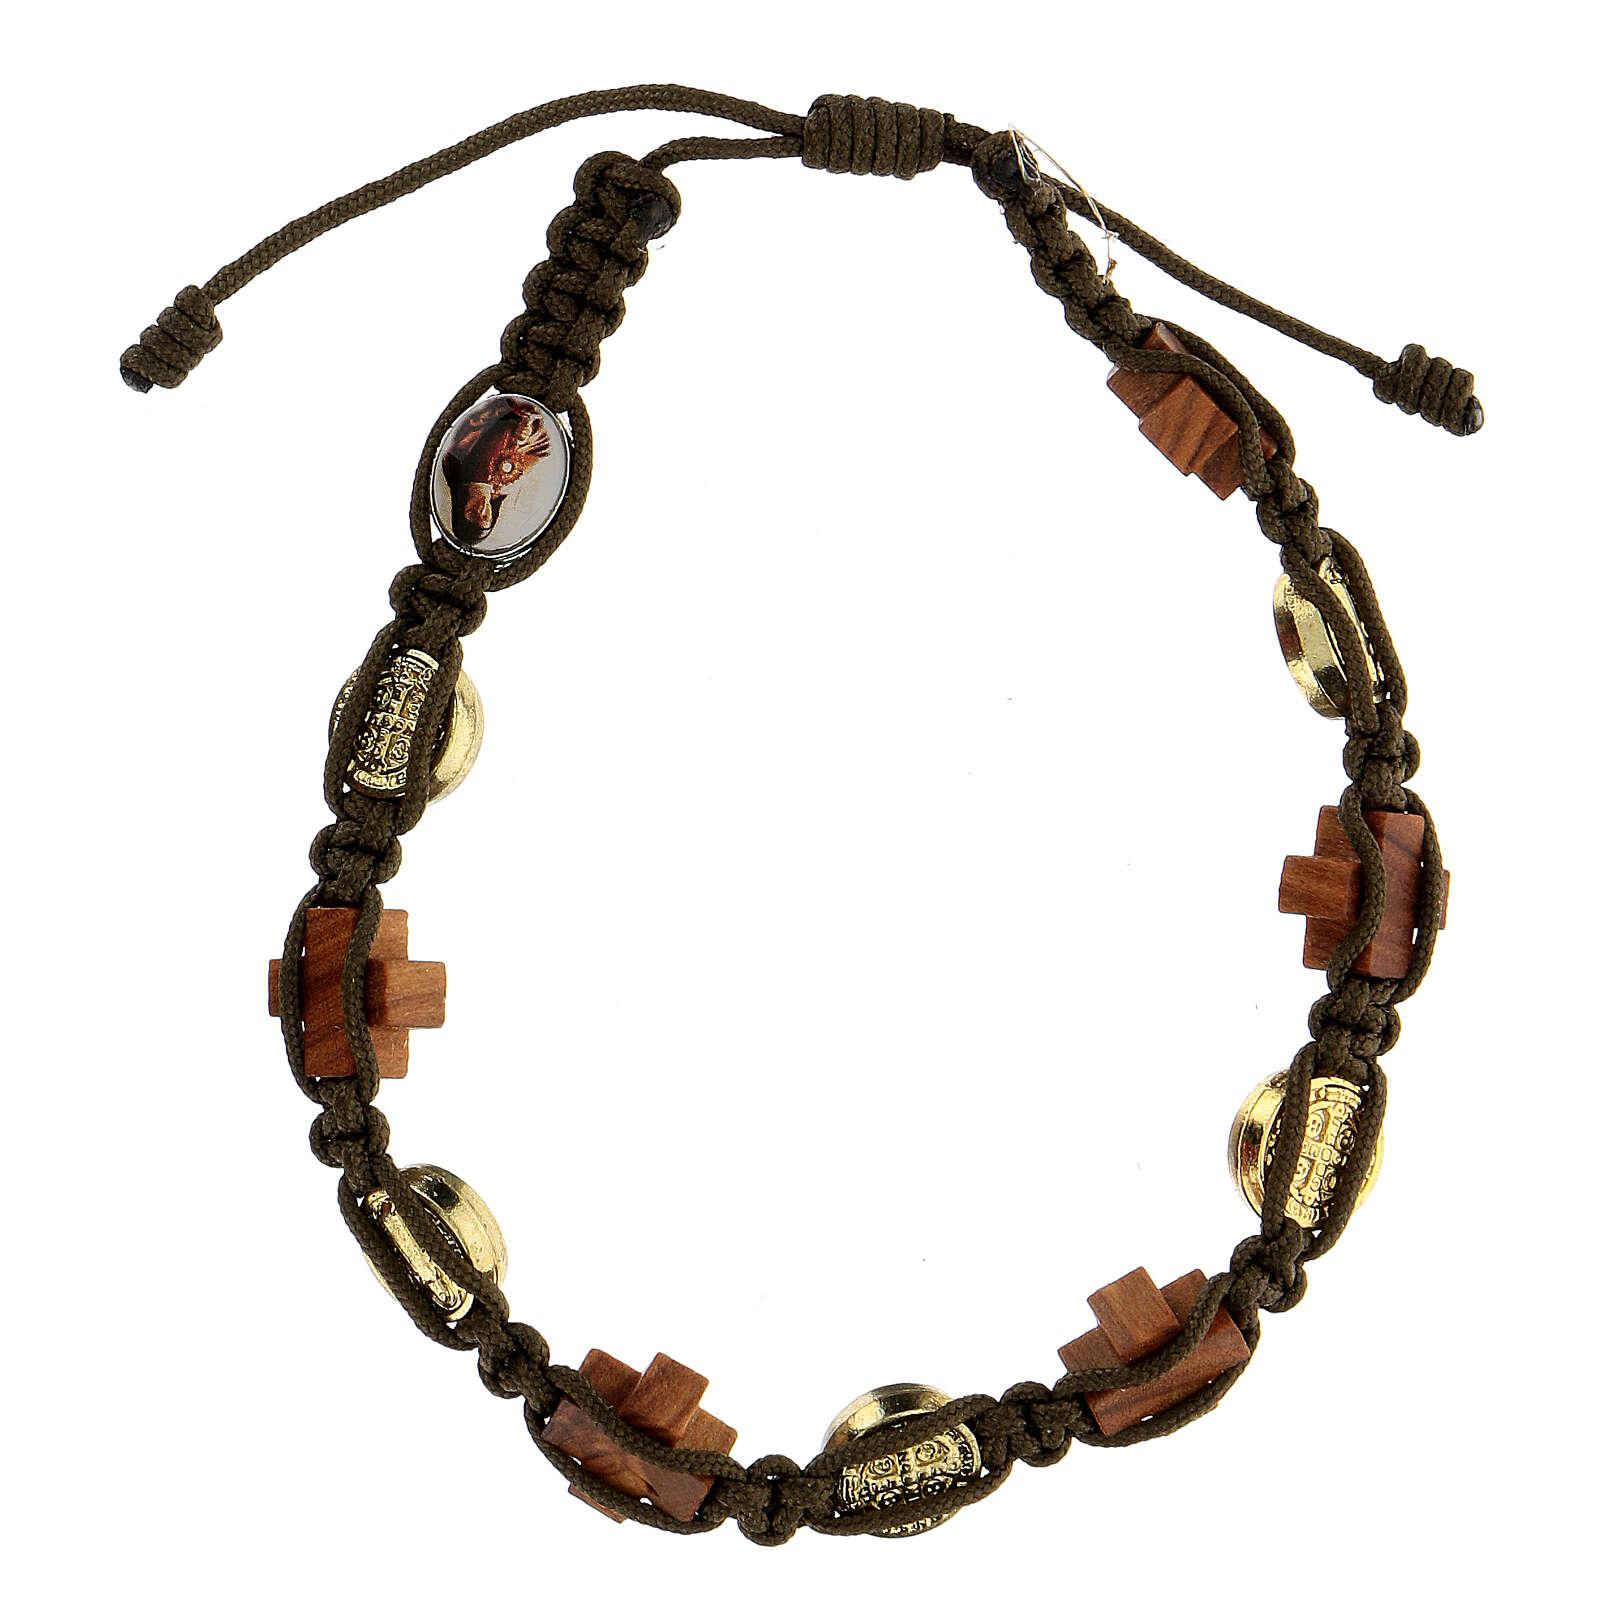 Bracciale Medjugorje medaglia croci legno corda marrone 4